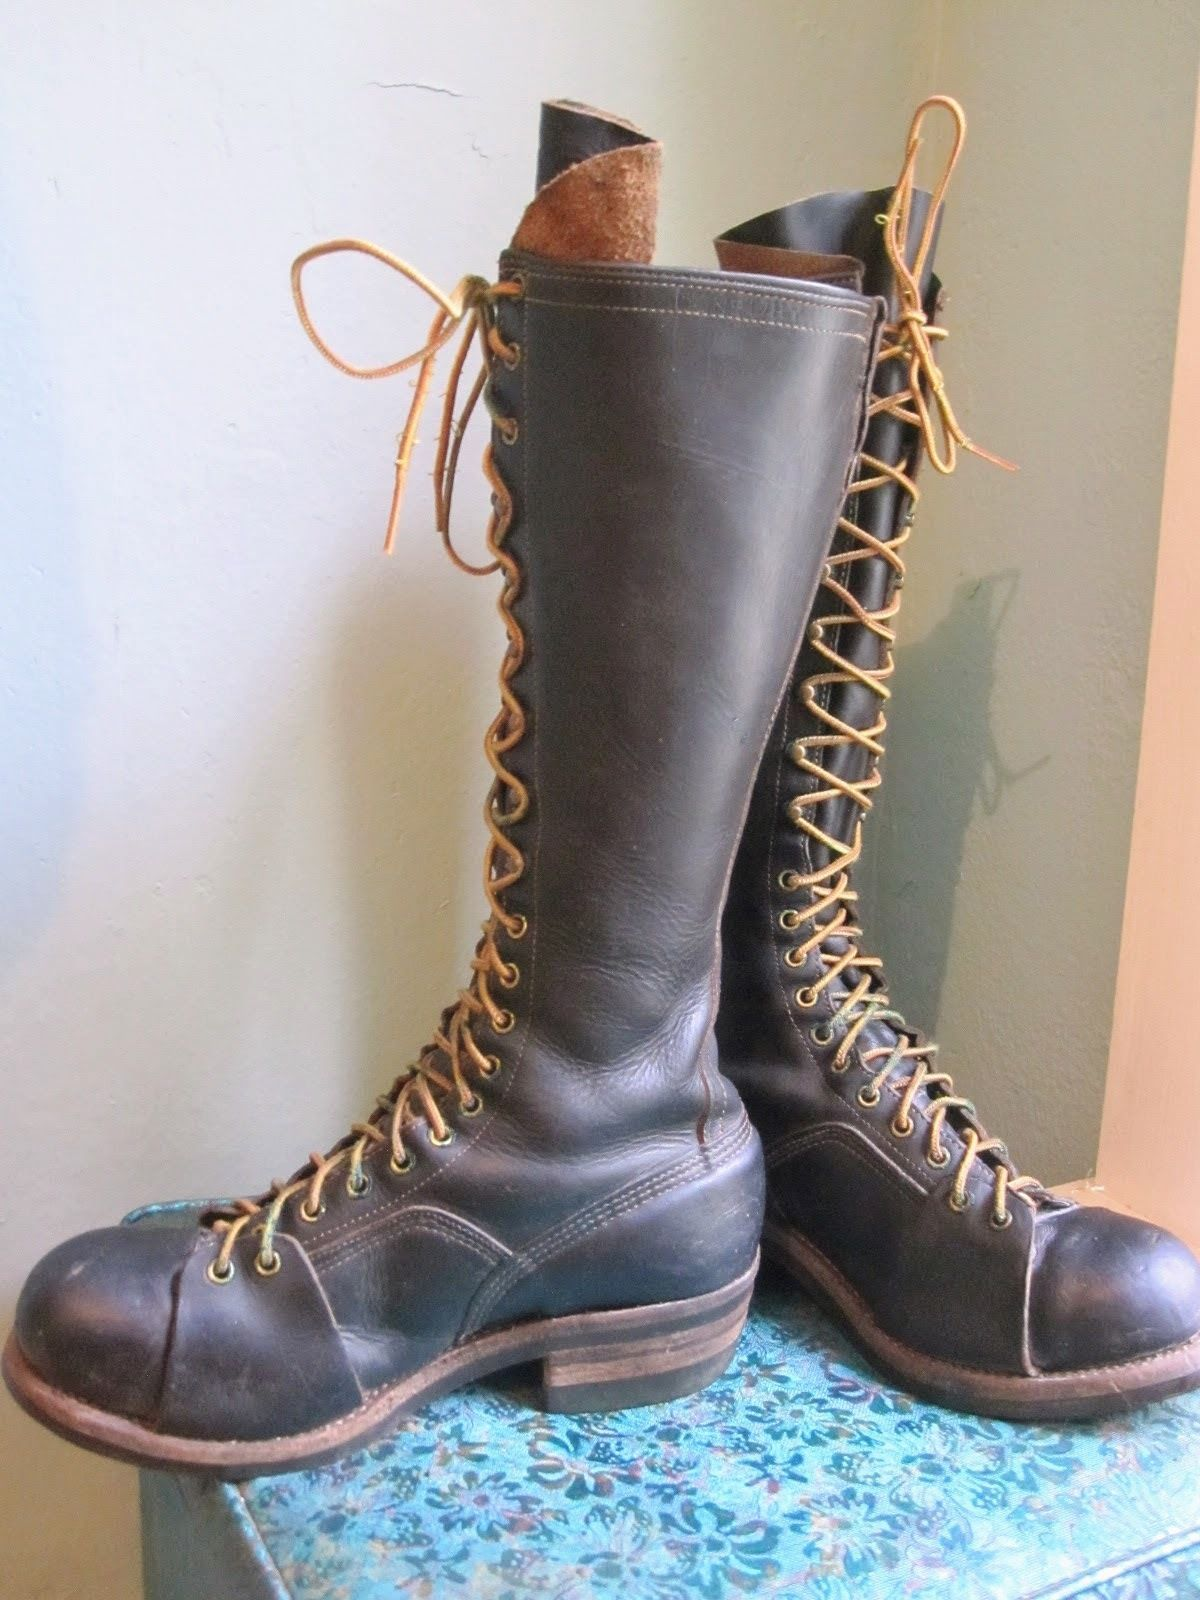 049c01d0fc5f VTG RARE 1920s-50s Bone-Dry Tall Steel Toe Work Boots! TACOMA WA